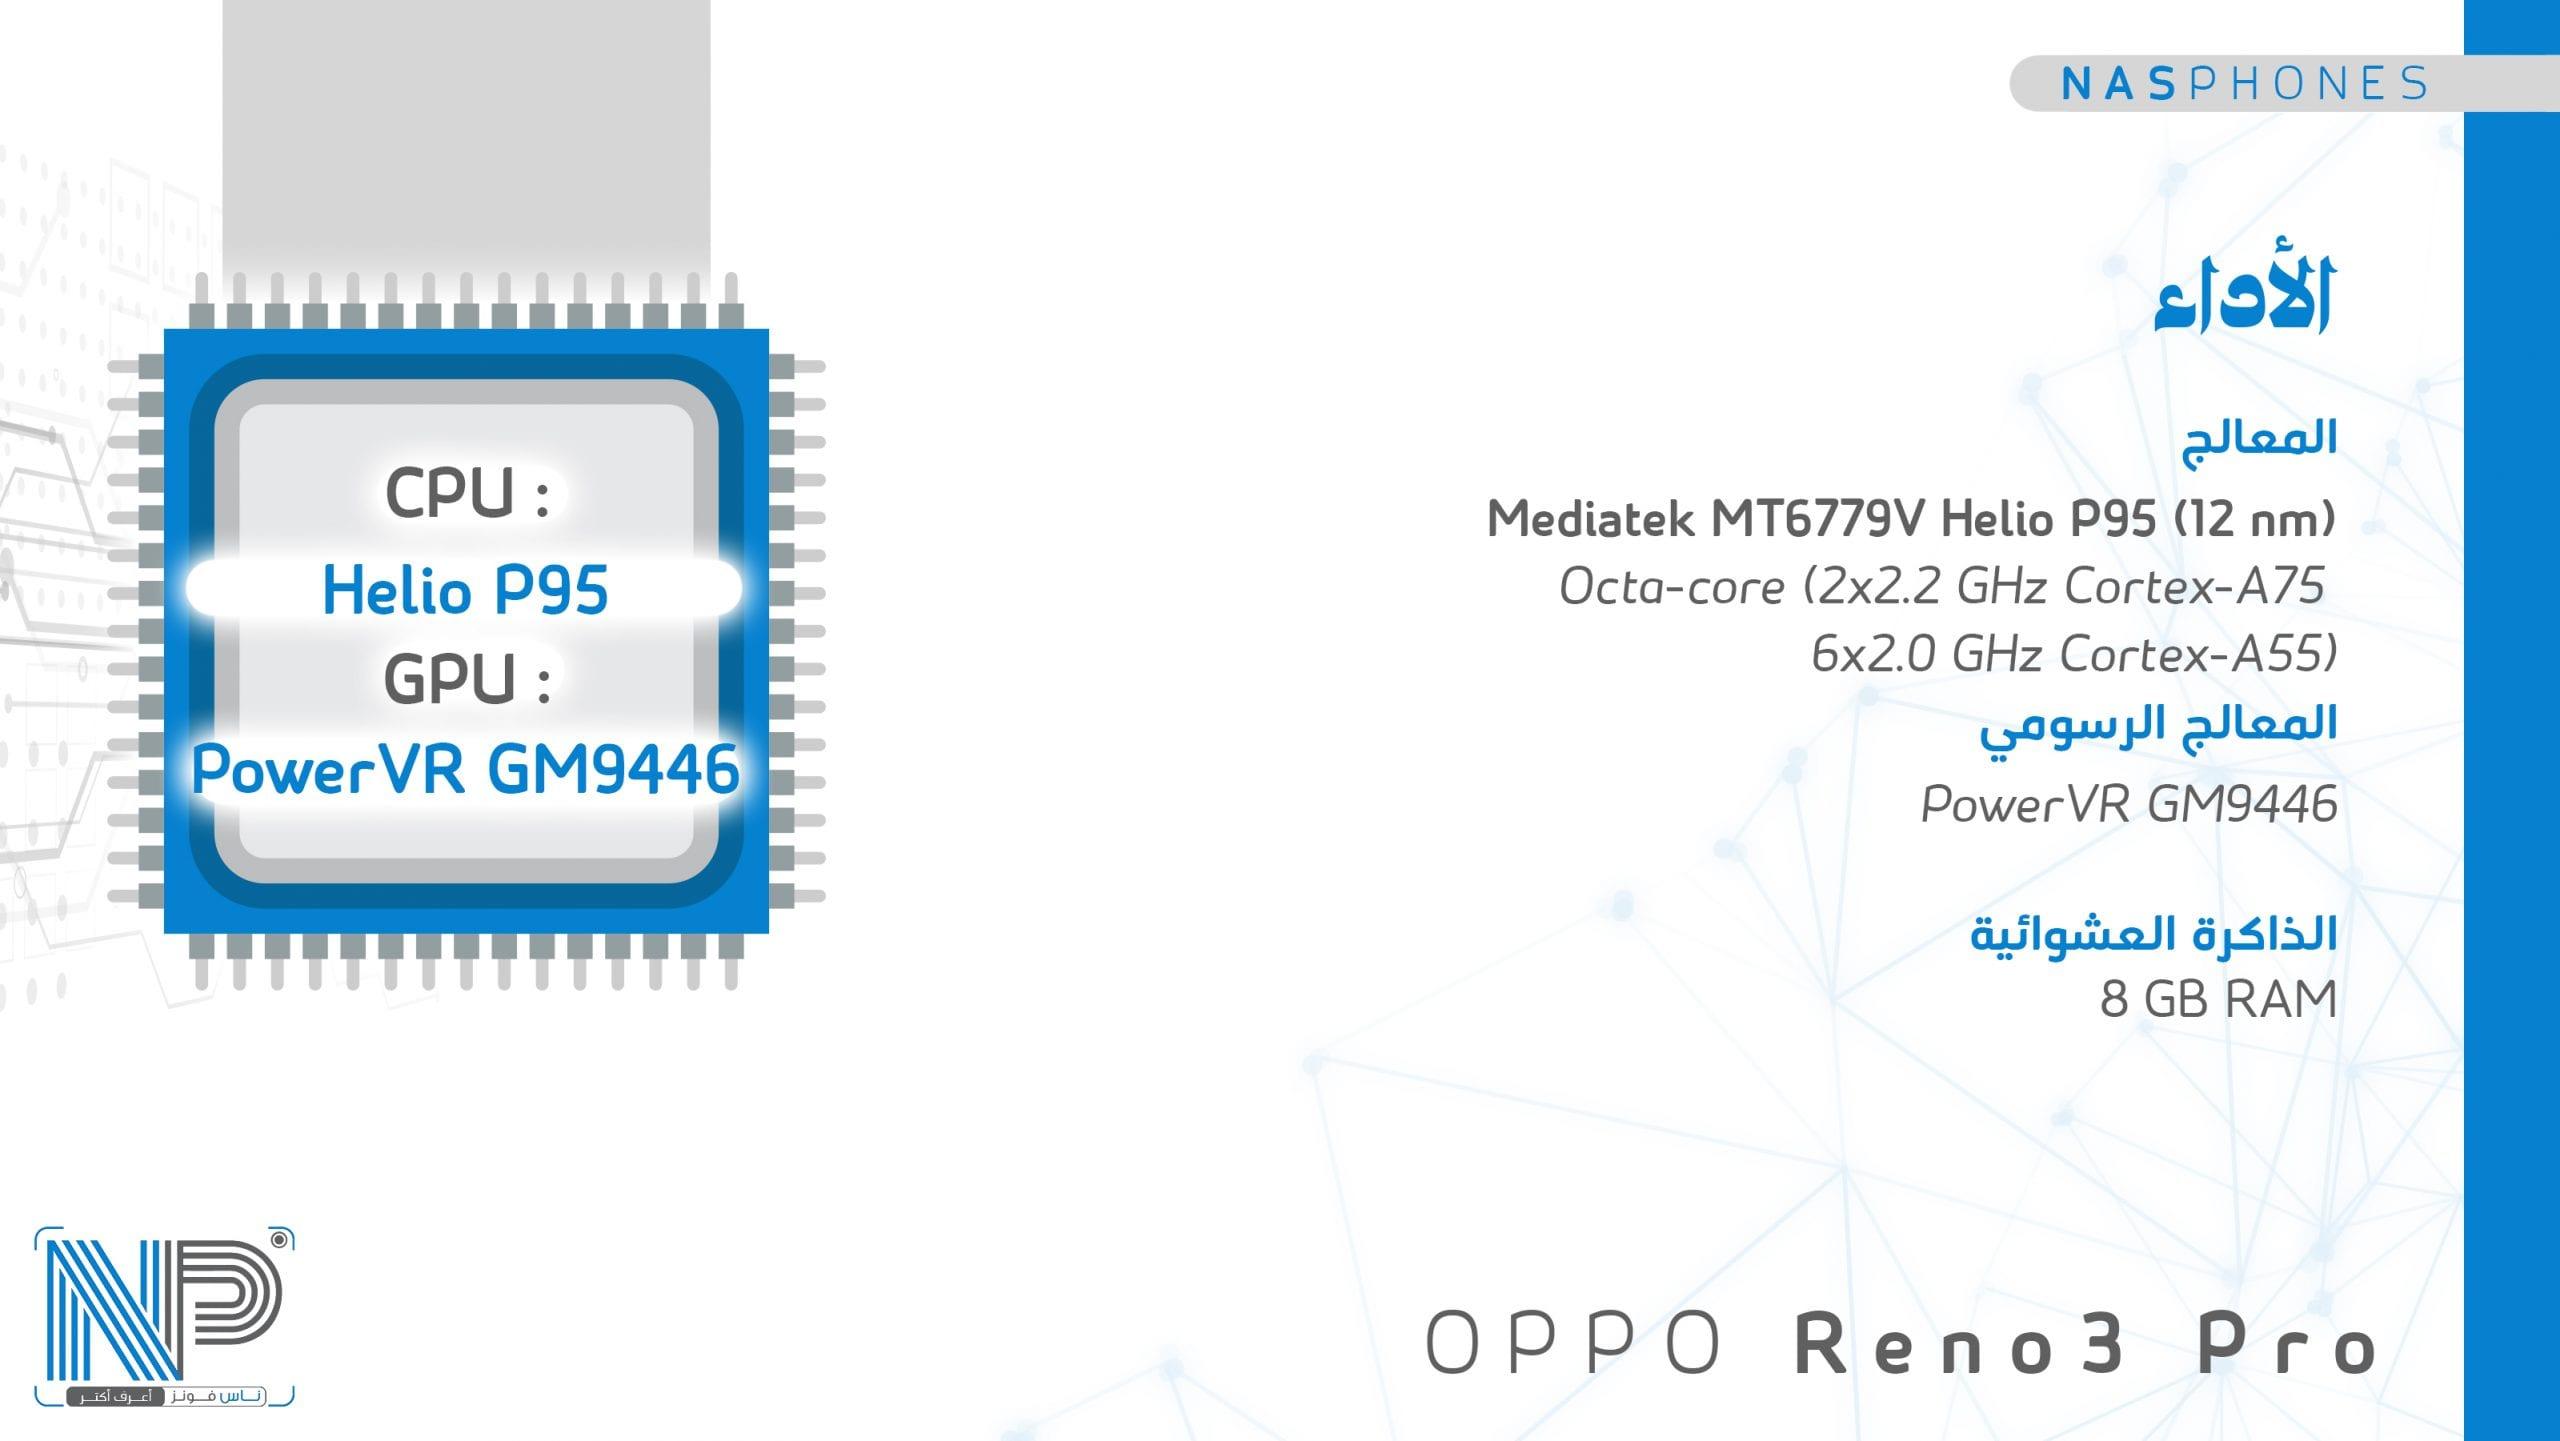 أداء موبايل Oppo reno 3 pro